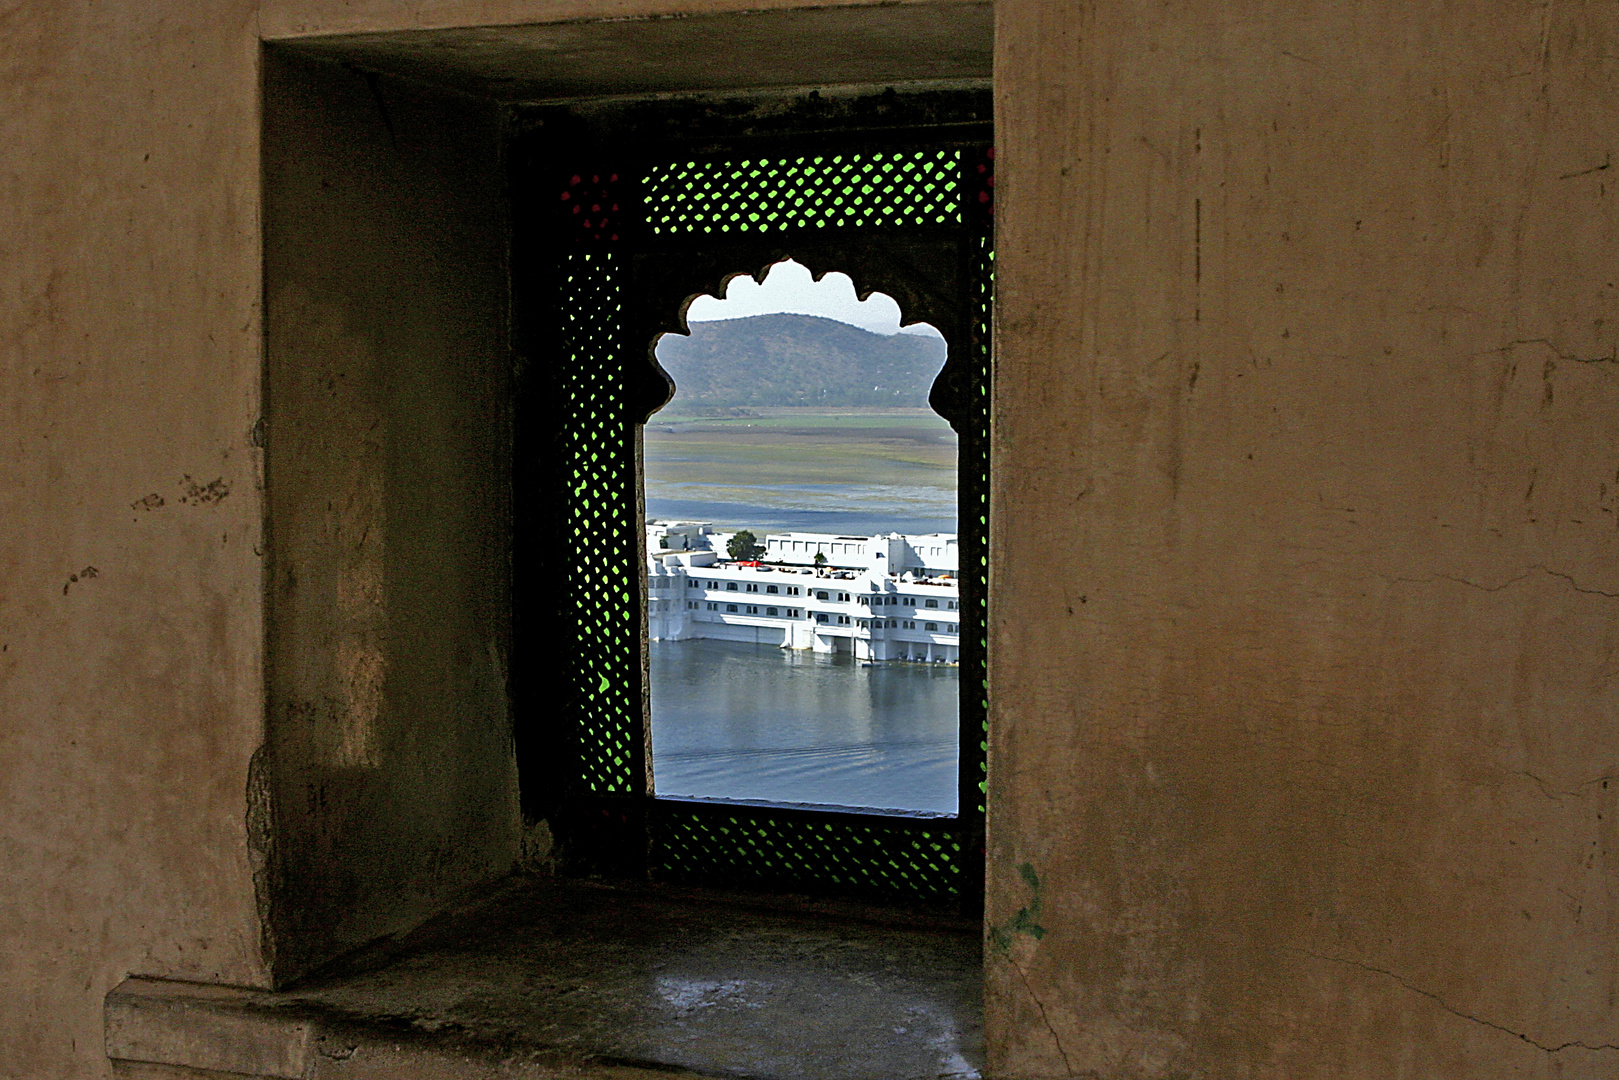 Hotel Taj Lake Palace in Udaipur/India